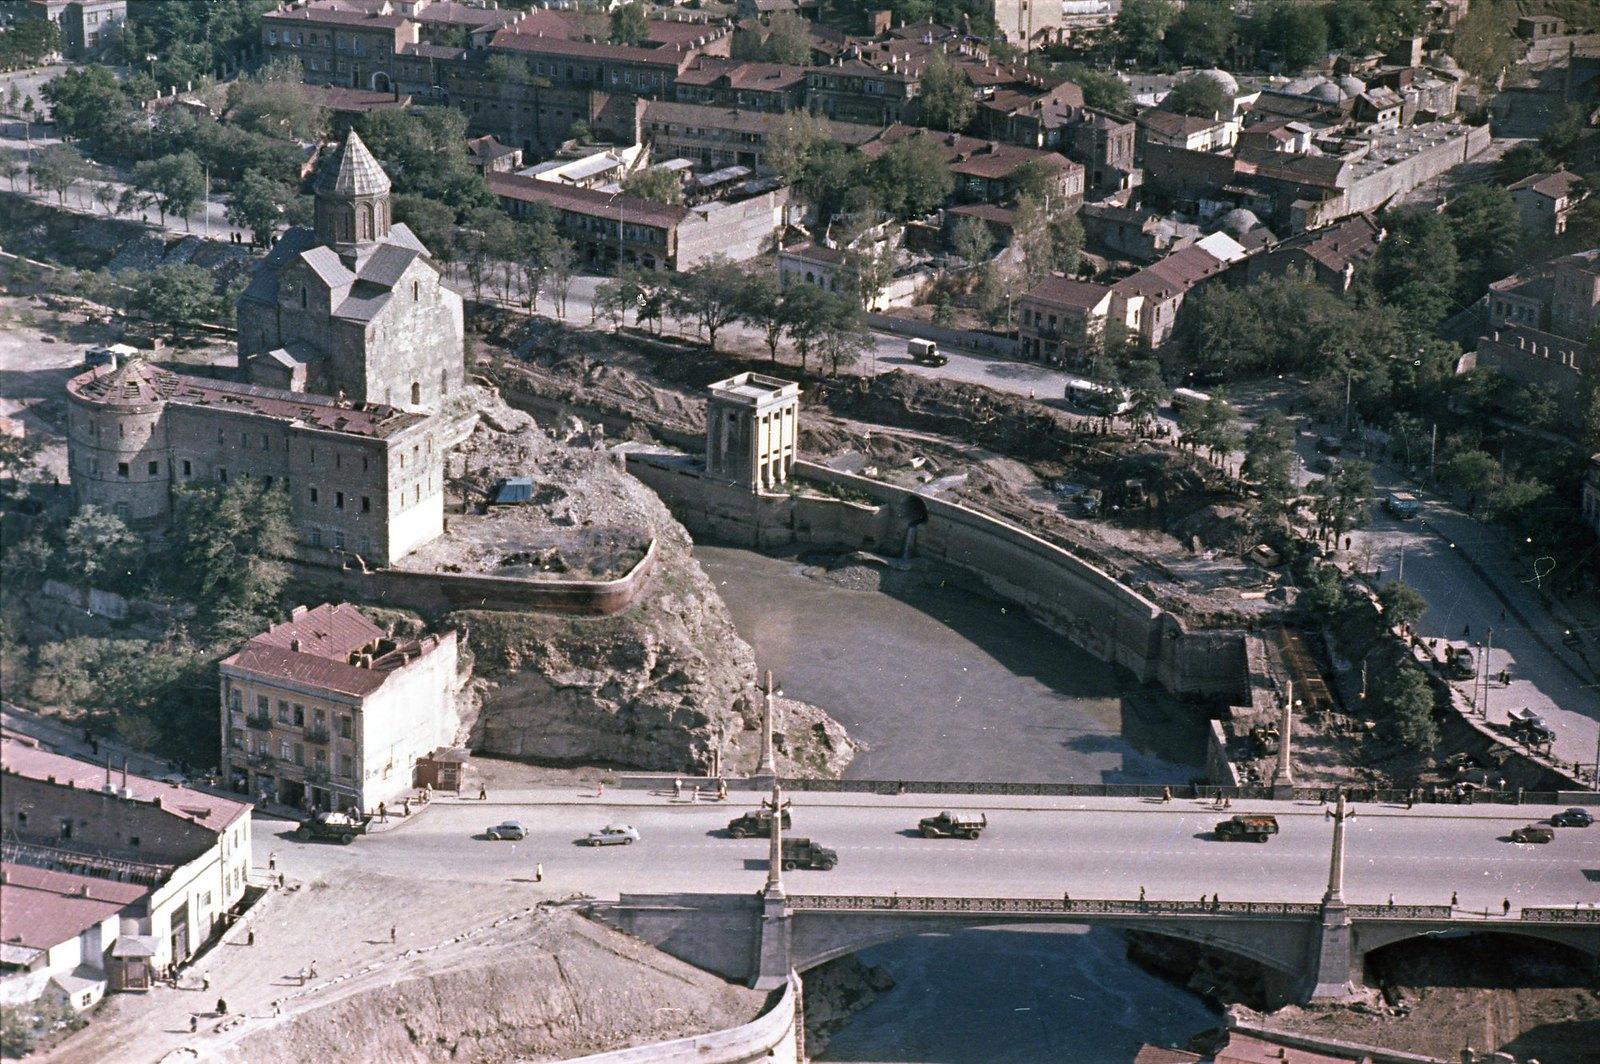 Тбилиси. Вид на храм Метехи из вертолёта. сентябрь-октябрь